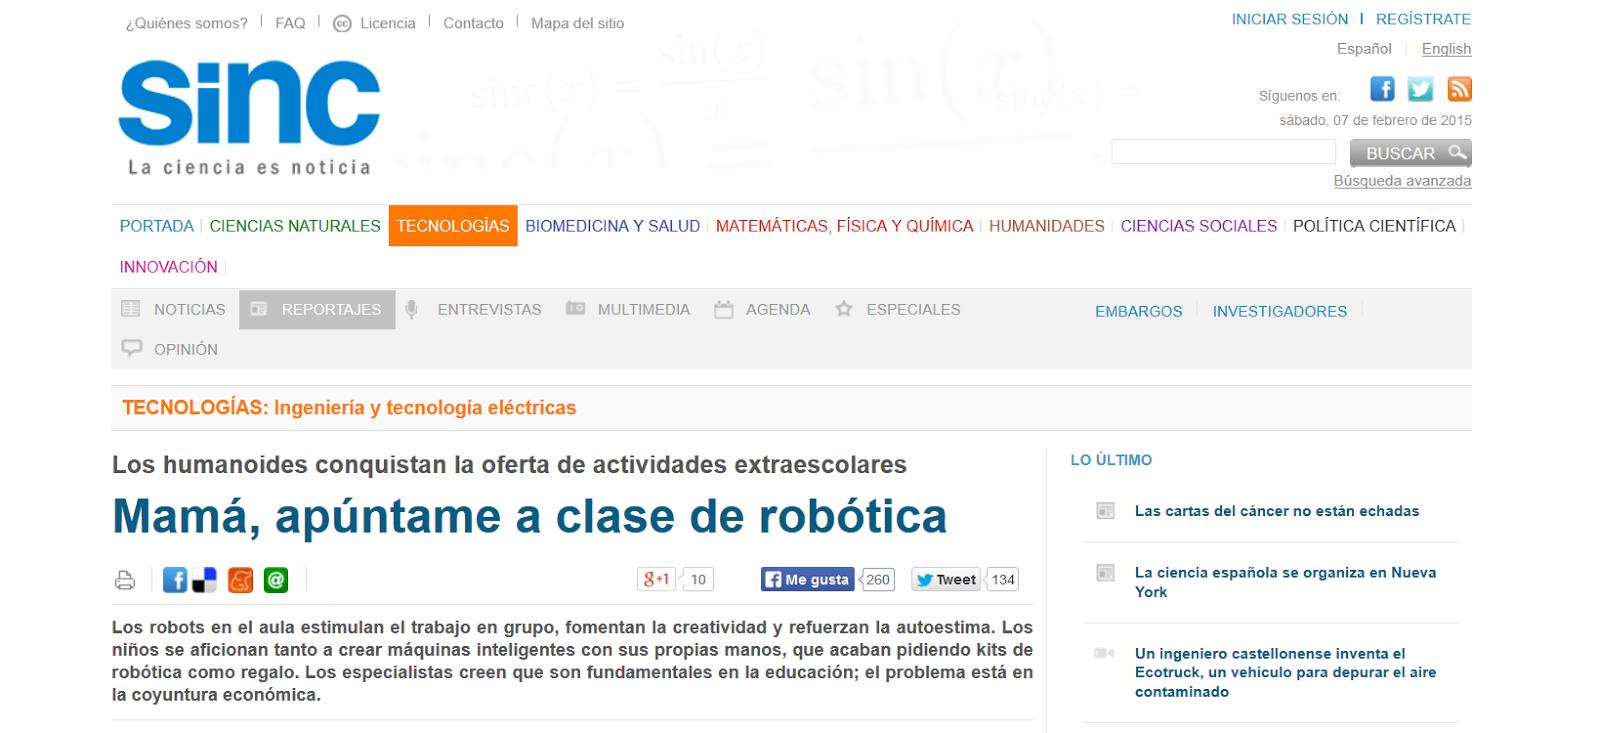 http://www.agenciasinc.es/Reportajes/Mama-apuntame-a-clase-de-robotica